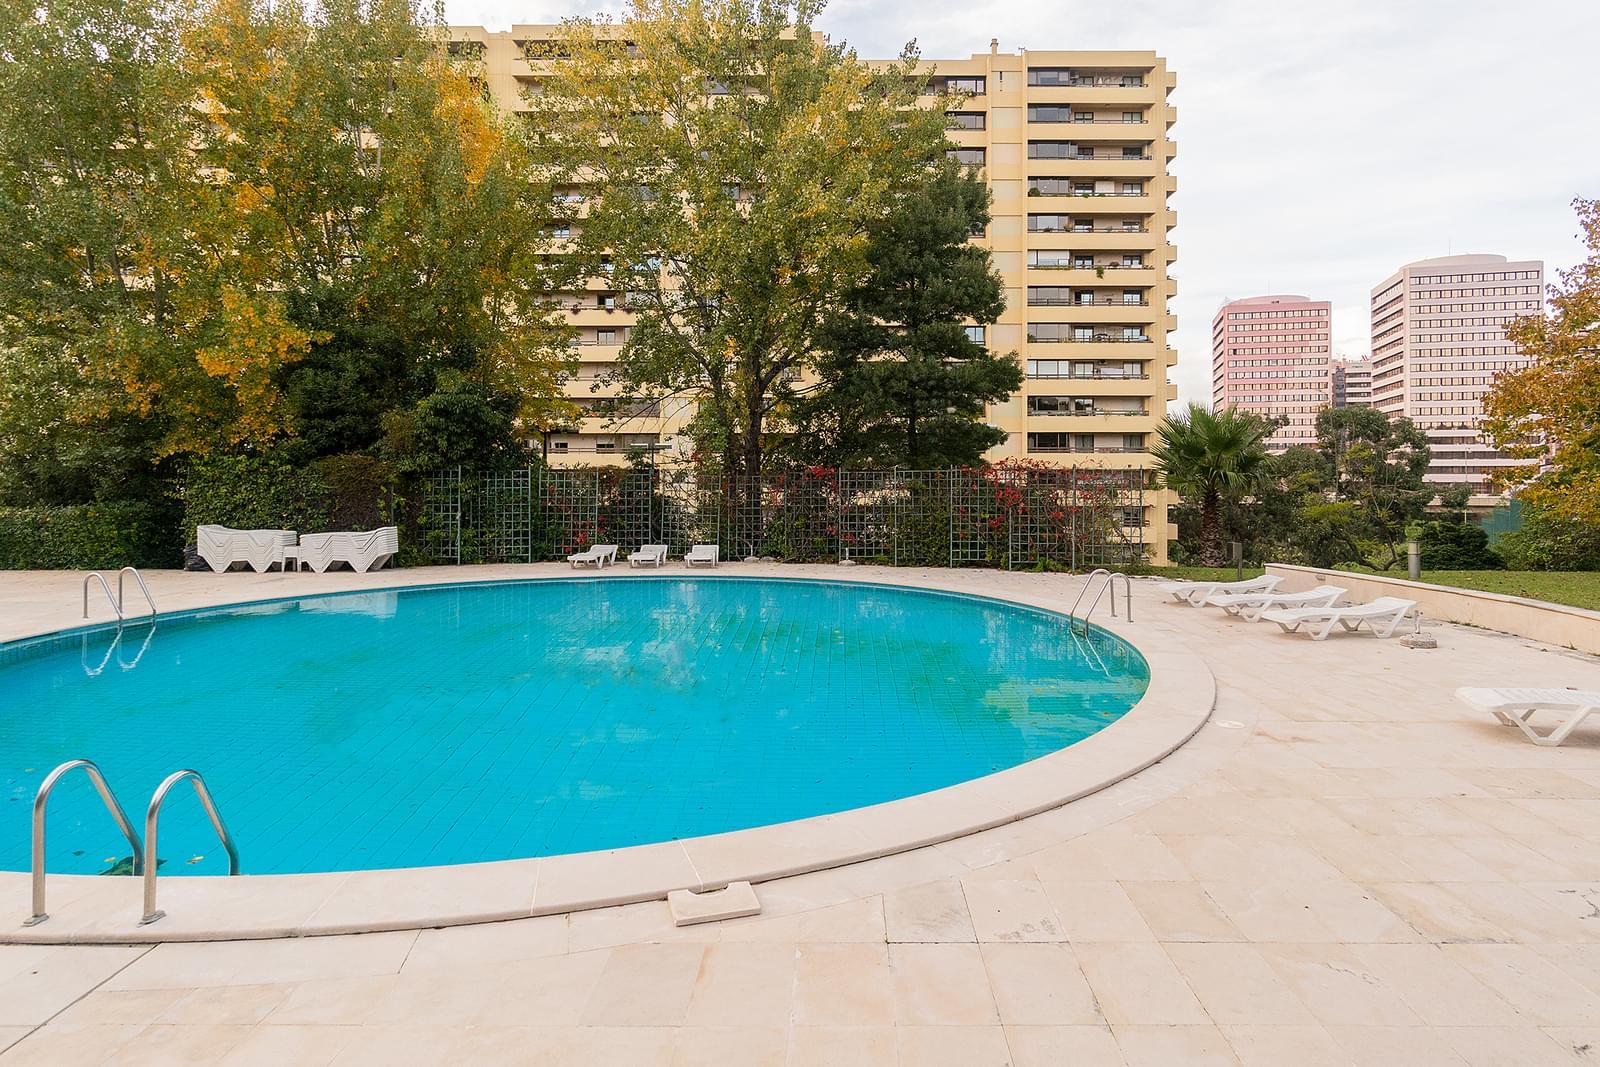 pf18551-apartamento-t3-1-lisboa-f4378c17-8181-49ee-b62c-677cbed23fe9